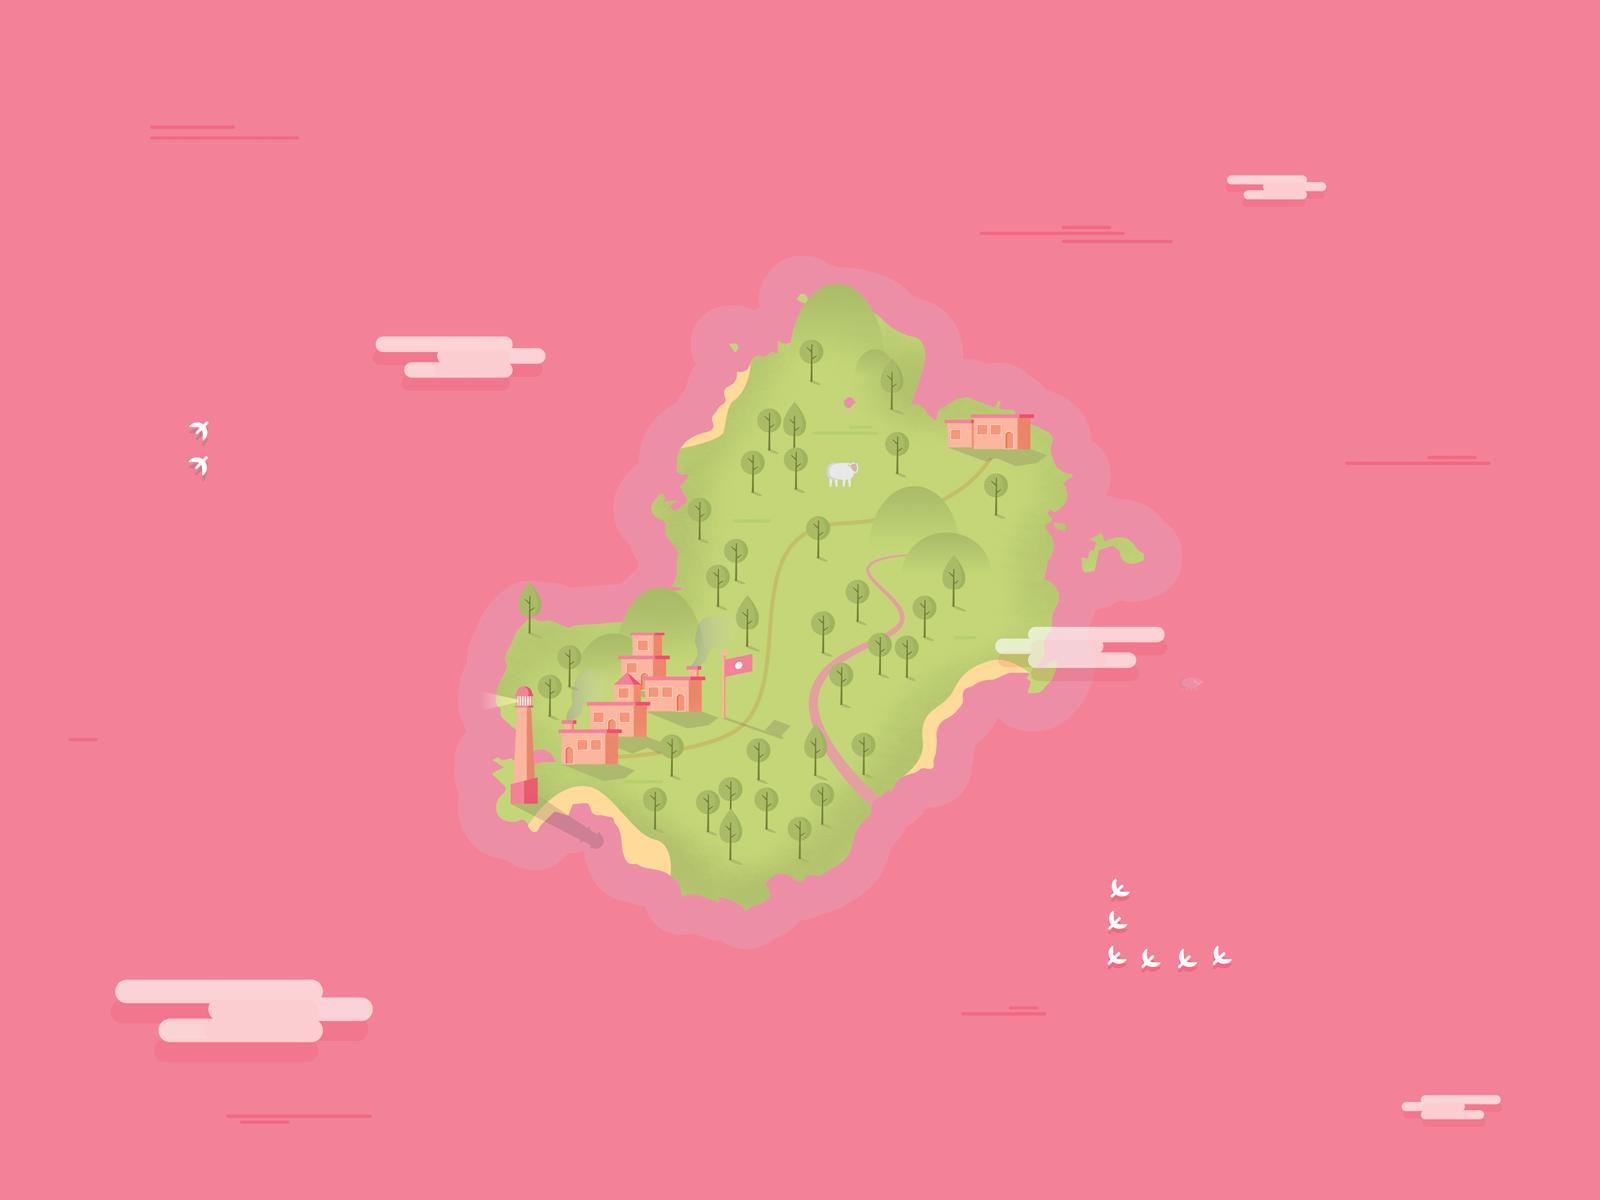 pink_map_hi_s